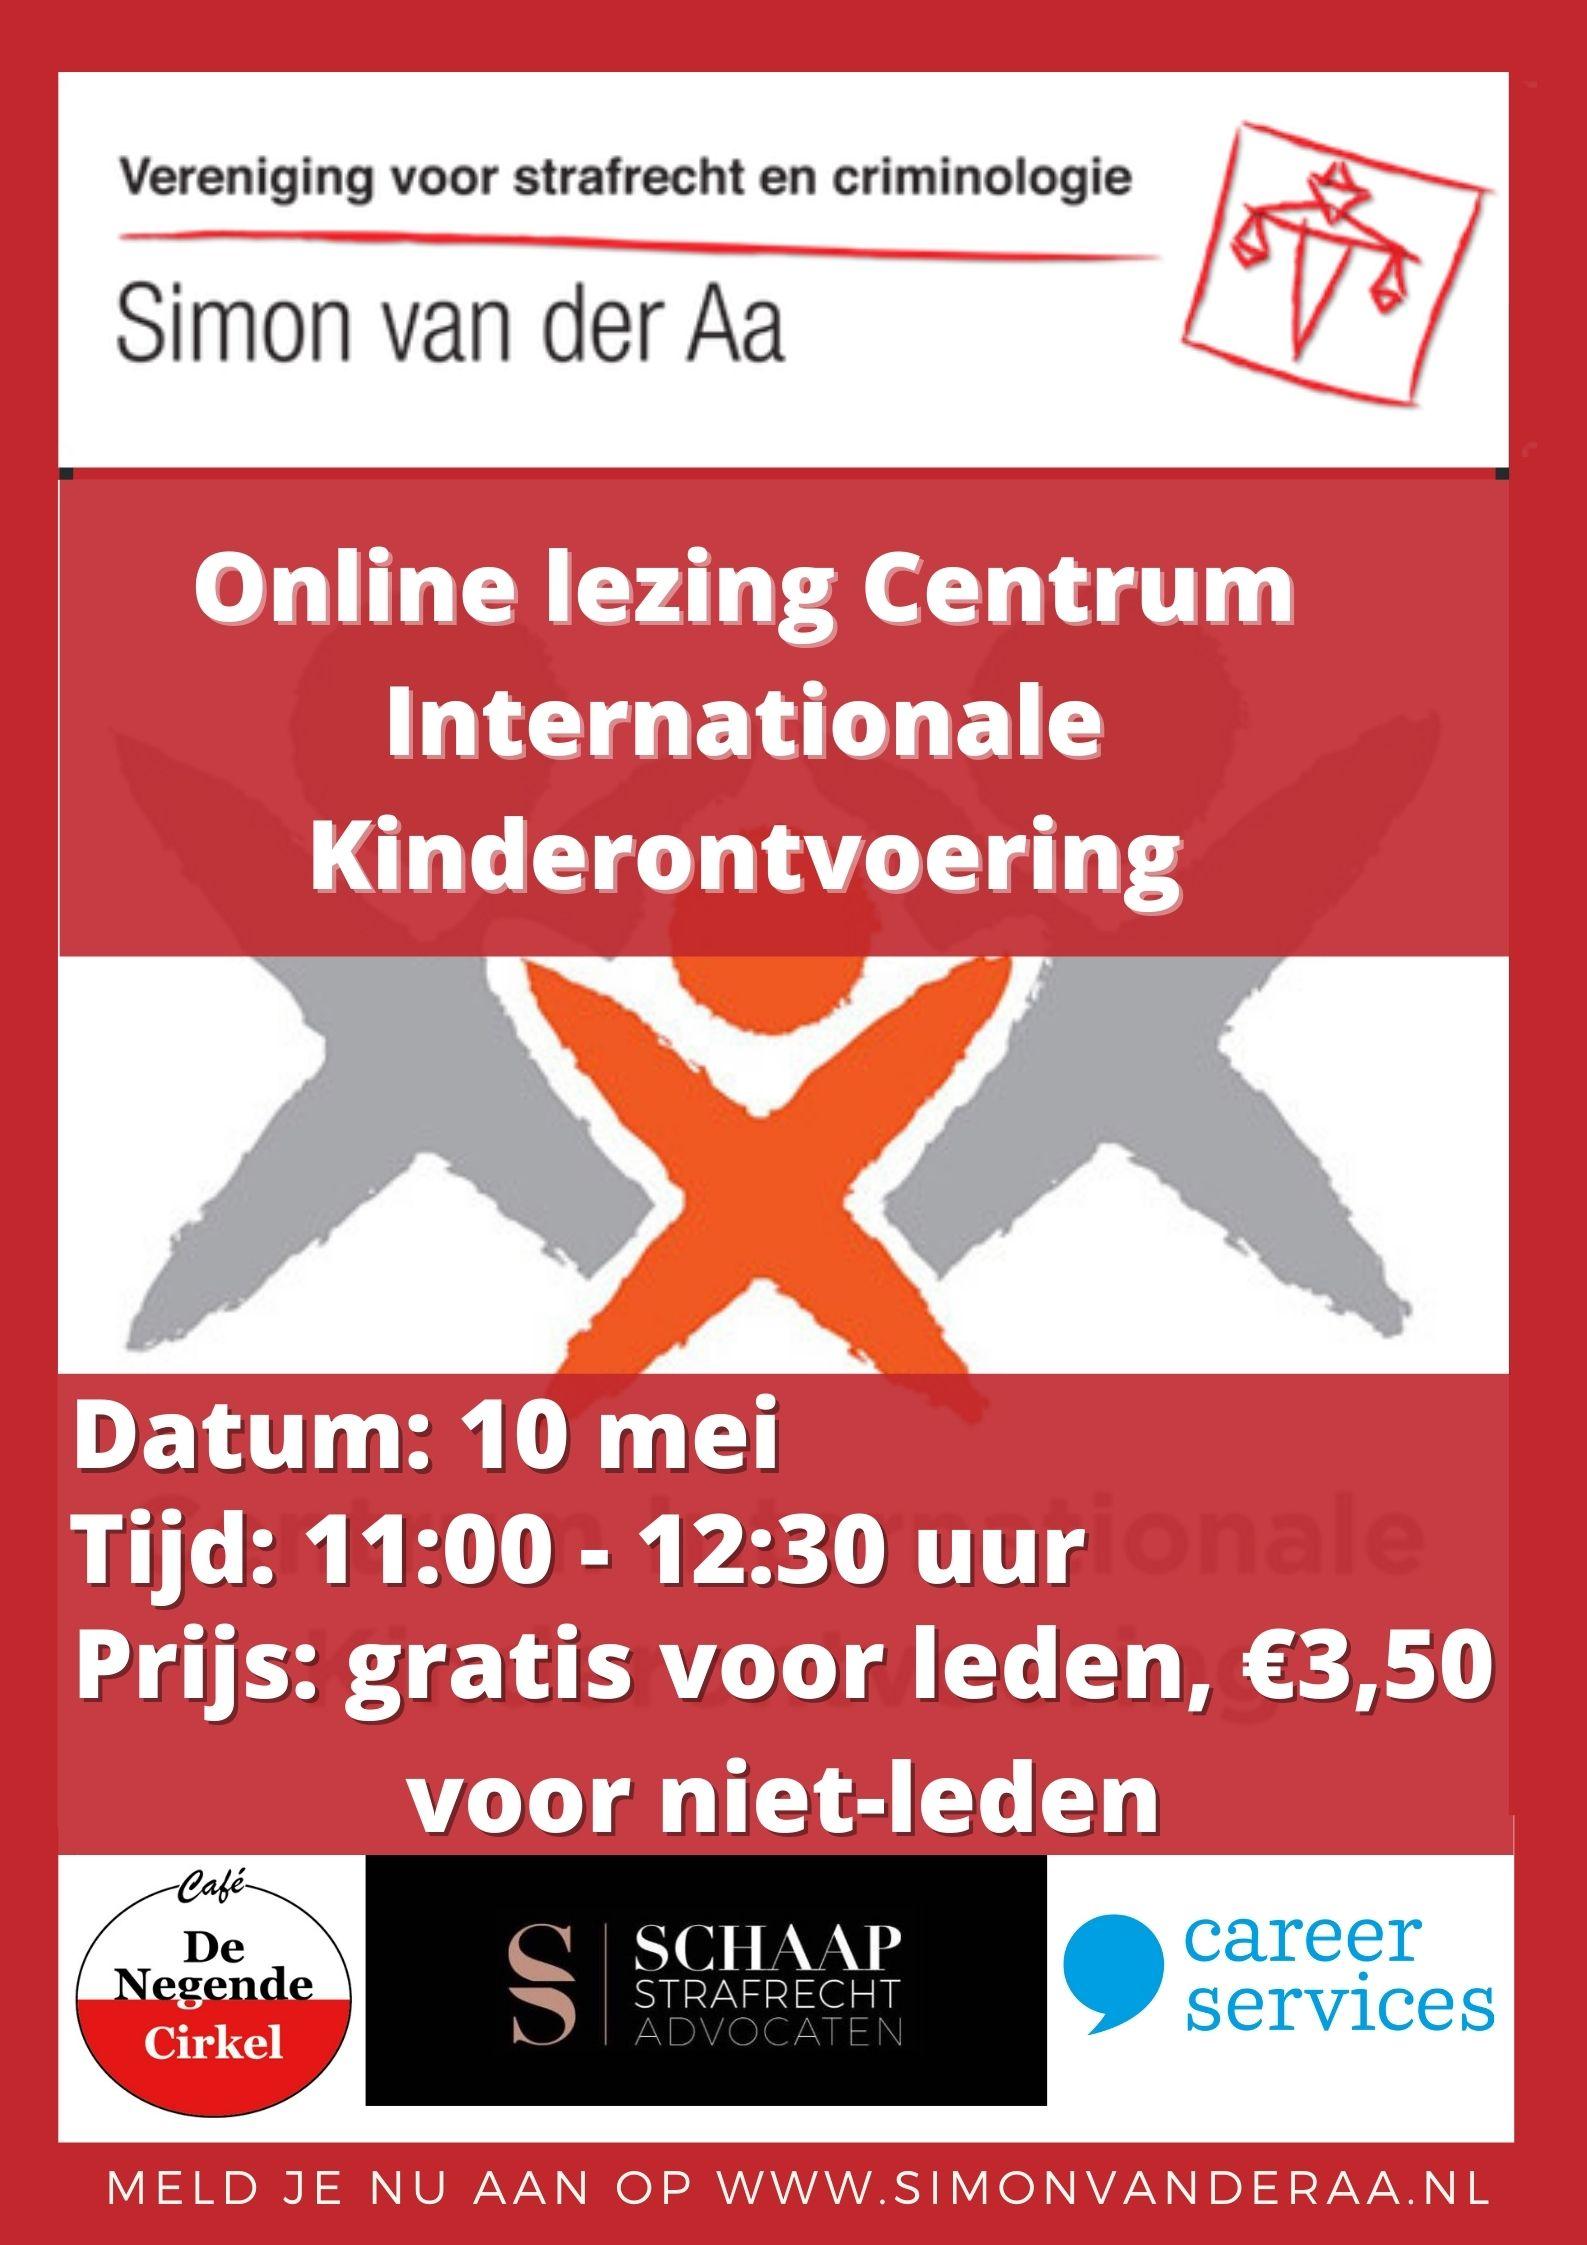 Online lezing Centrum Internationale Kinderontvoering